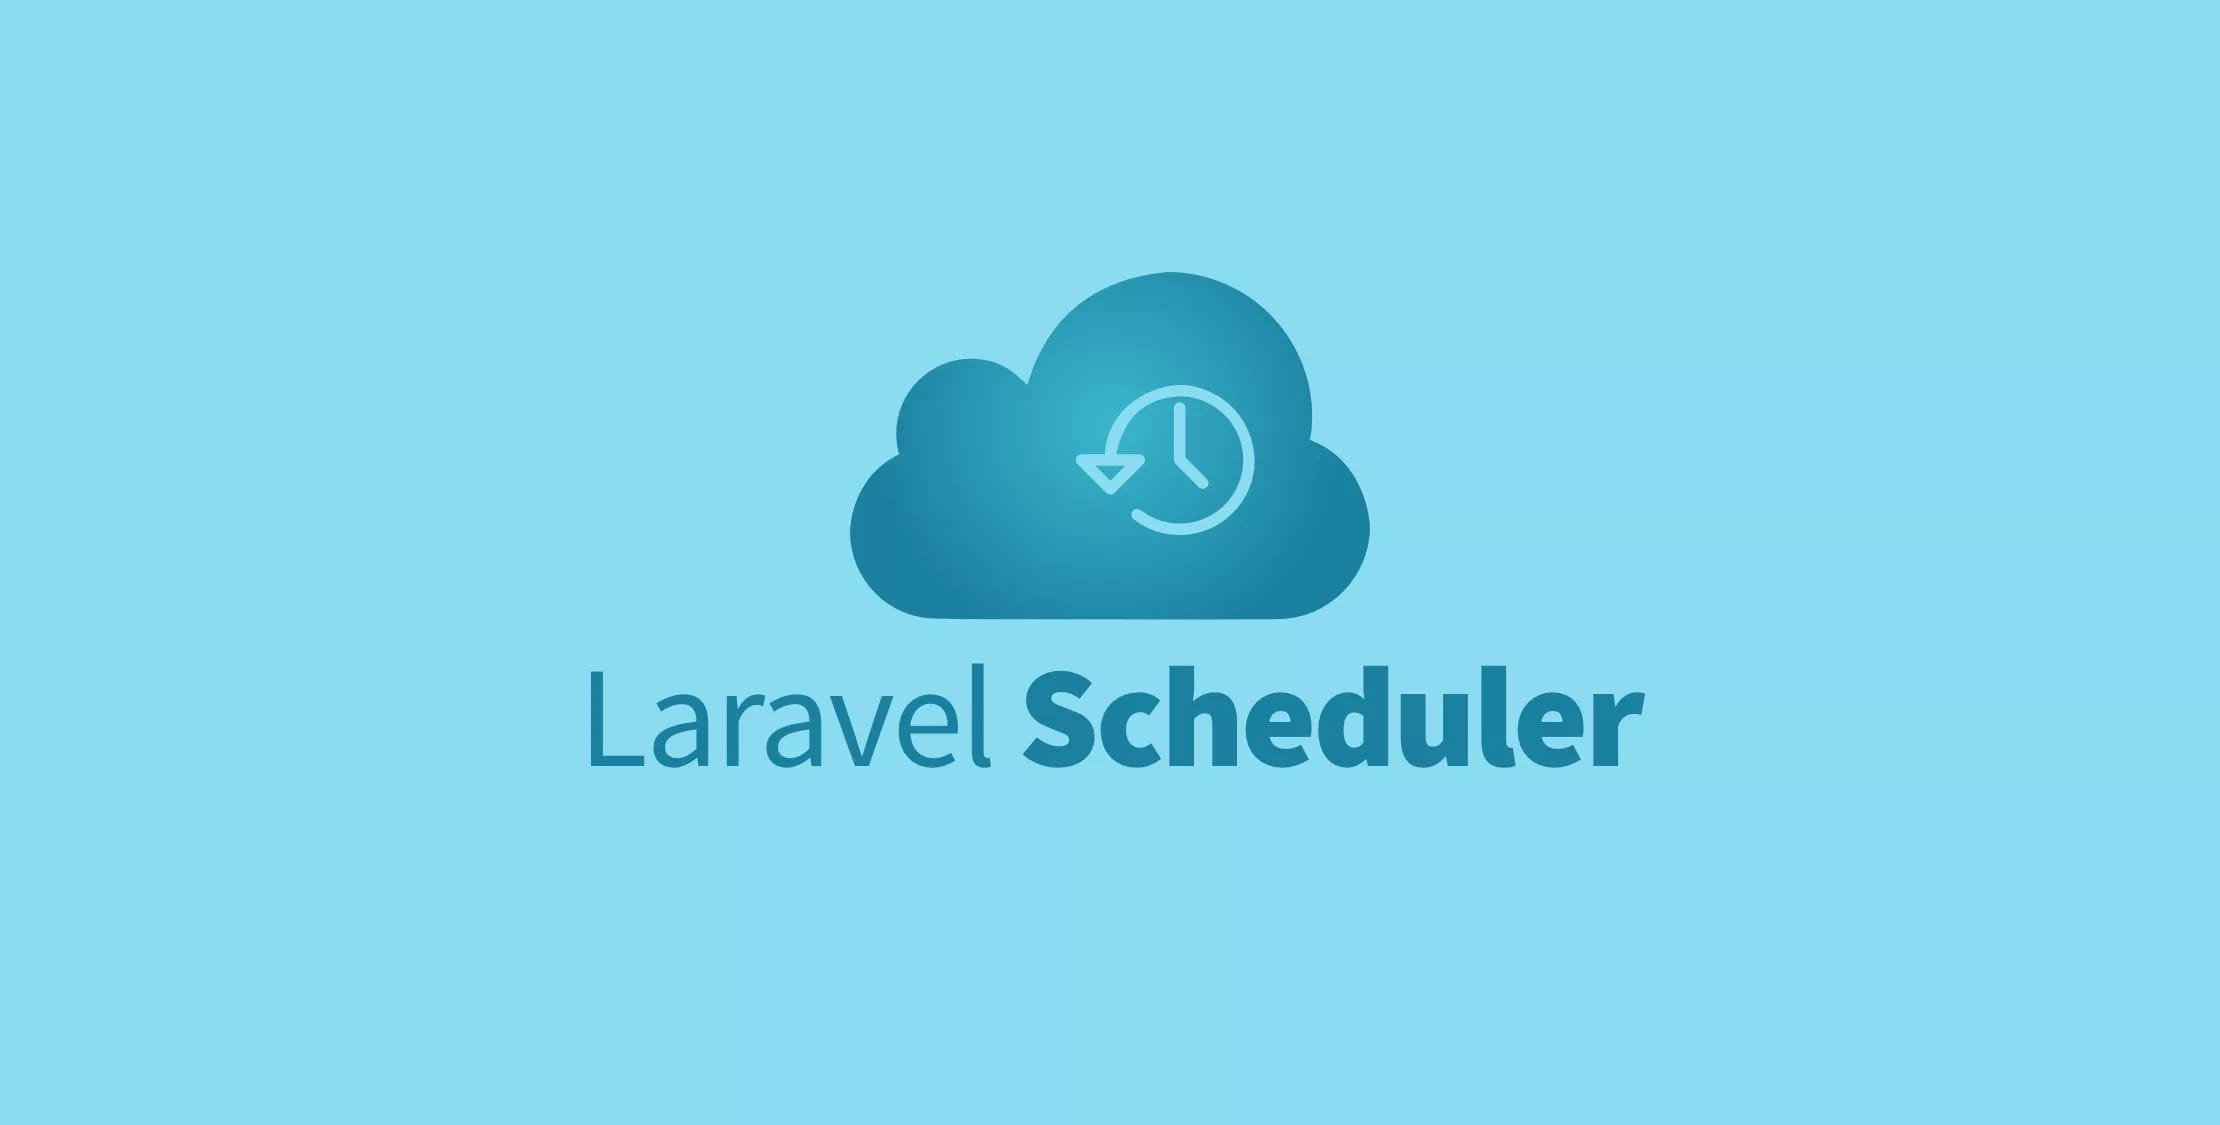 laravel使用scheduler实现计划任务